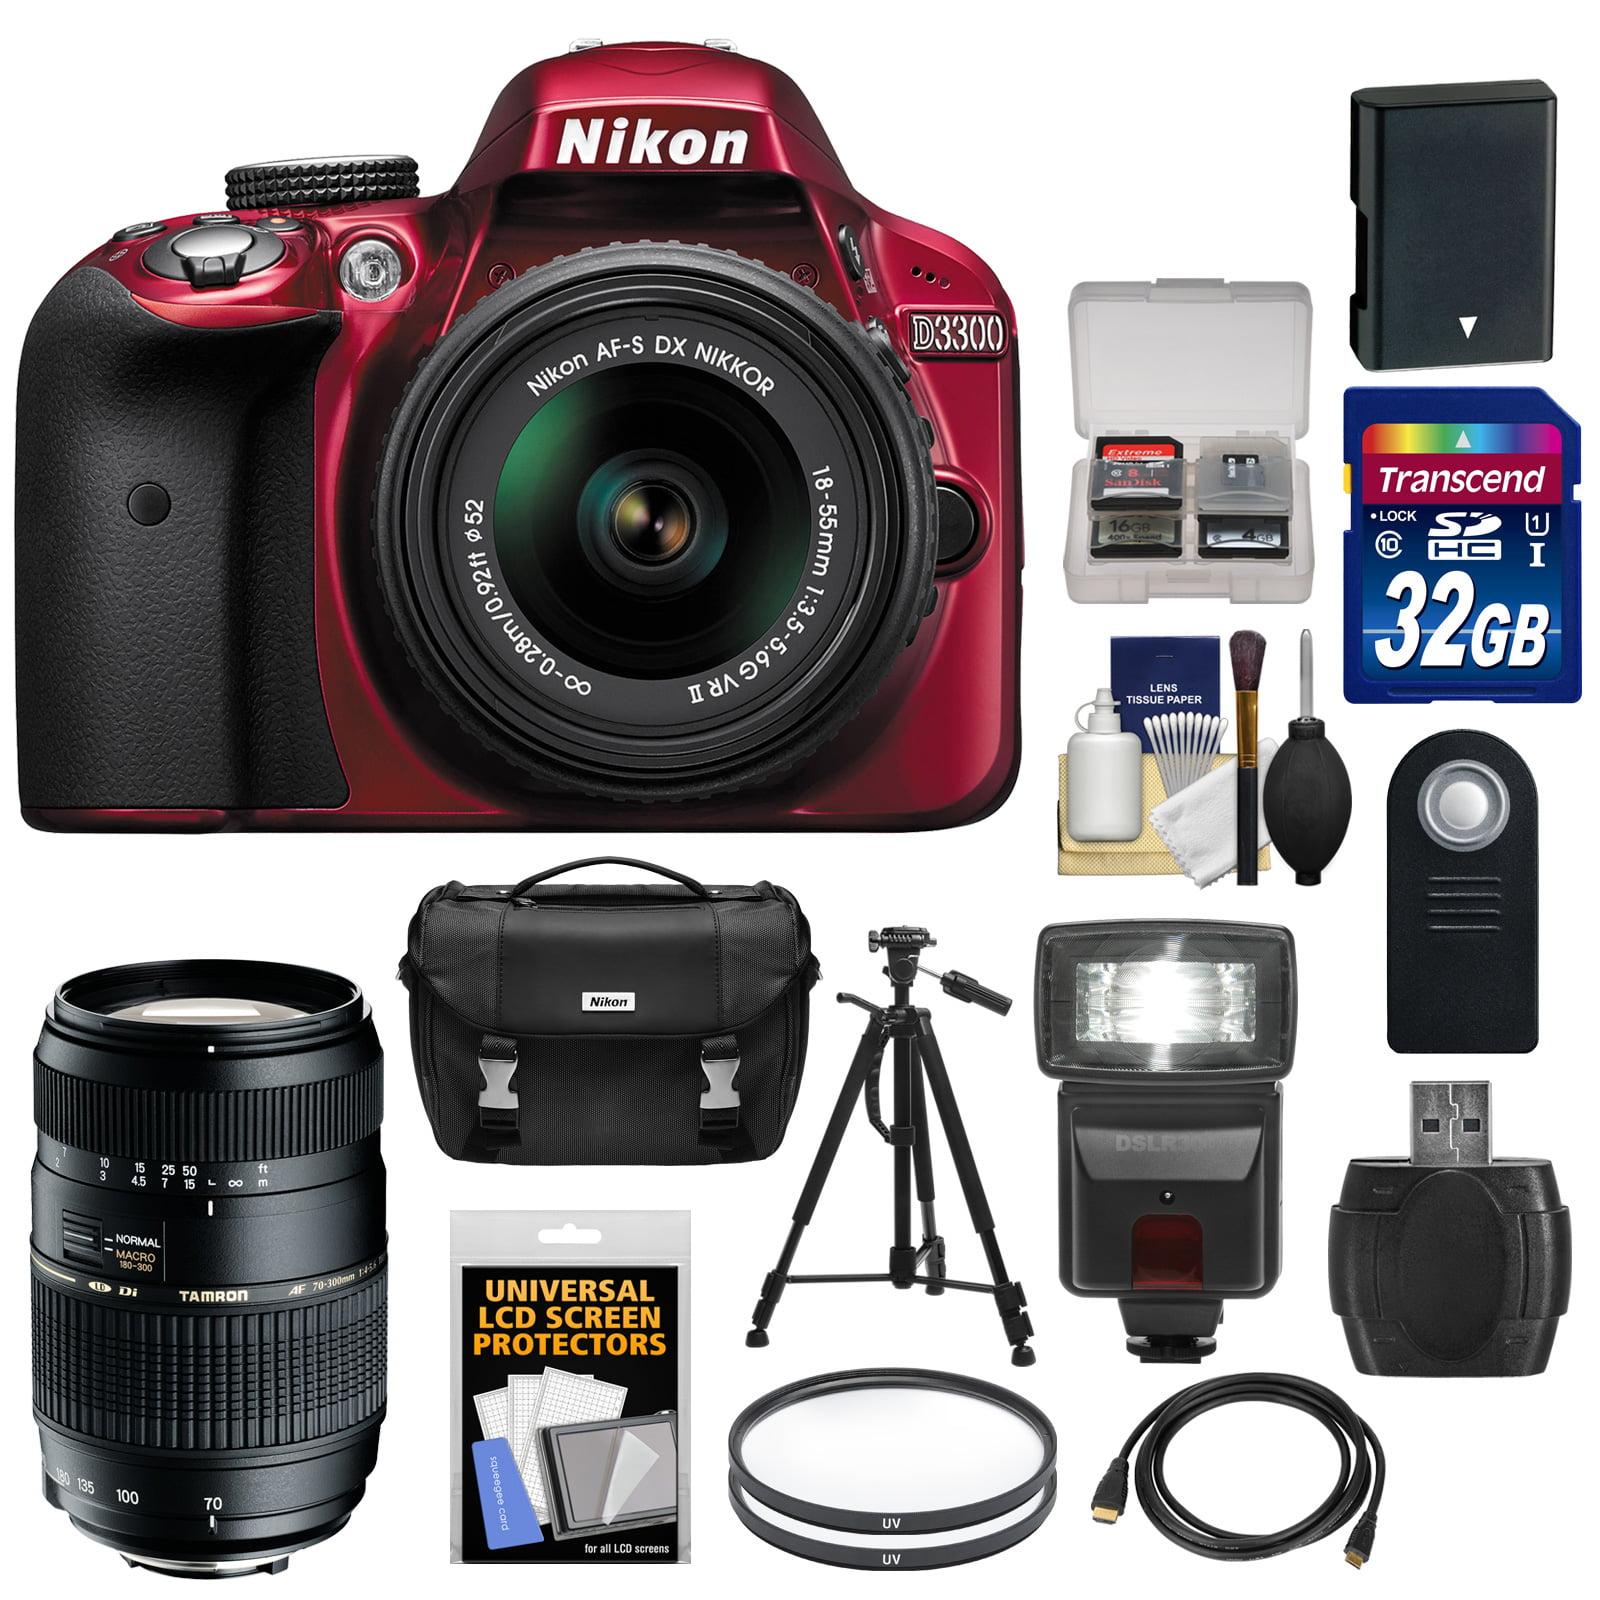 Nikon D3300 Digital SLR Camera & 18-55mm G VR DX II AF-S Zoom Lens (Red) with 70-300mm Lens + 32GB Card + Battery + Case + Filters + Flash + Tripod + Accessory Kit